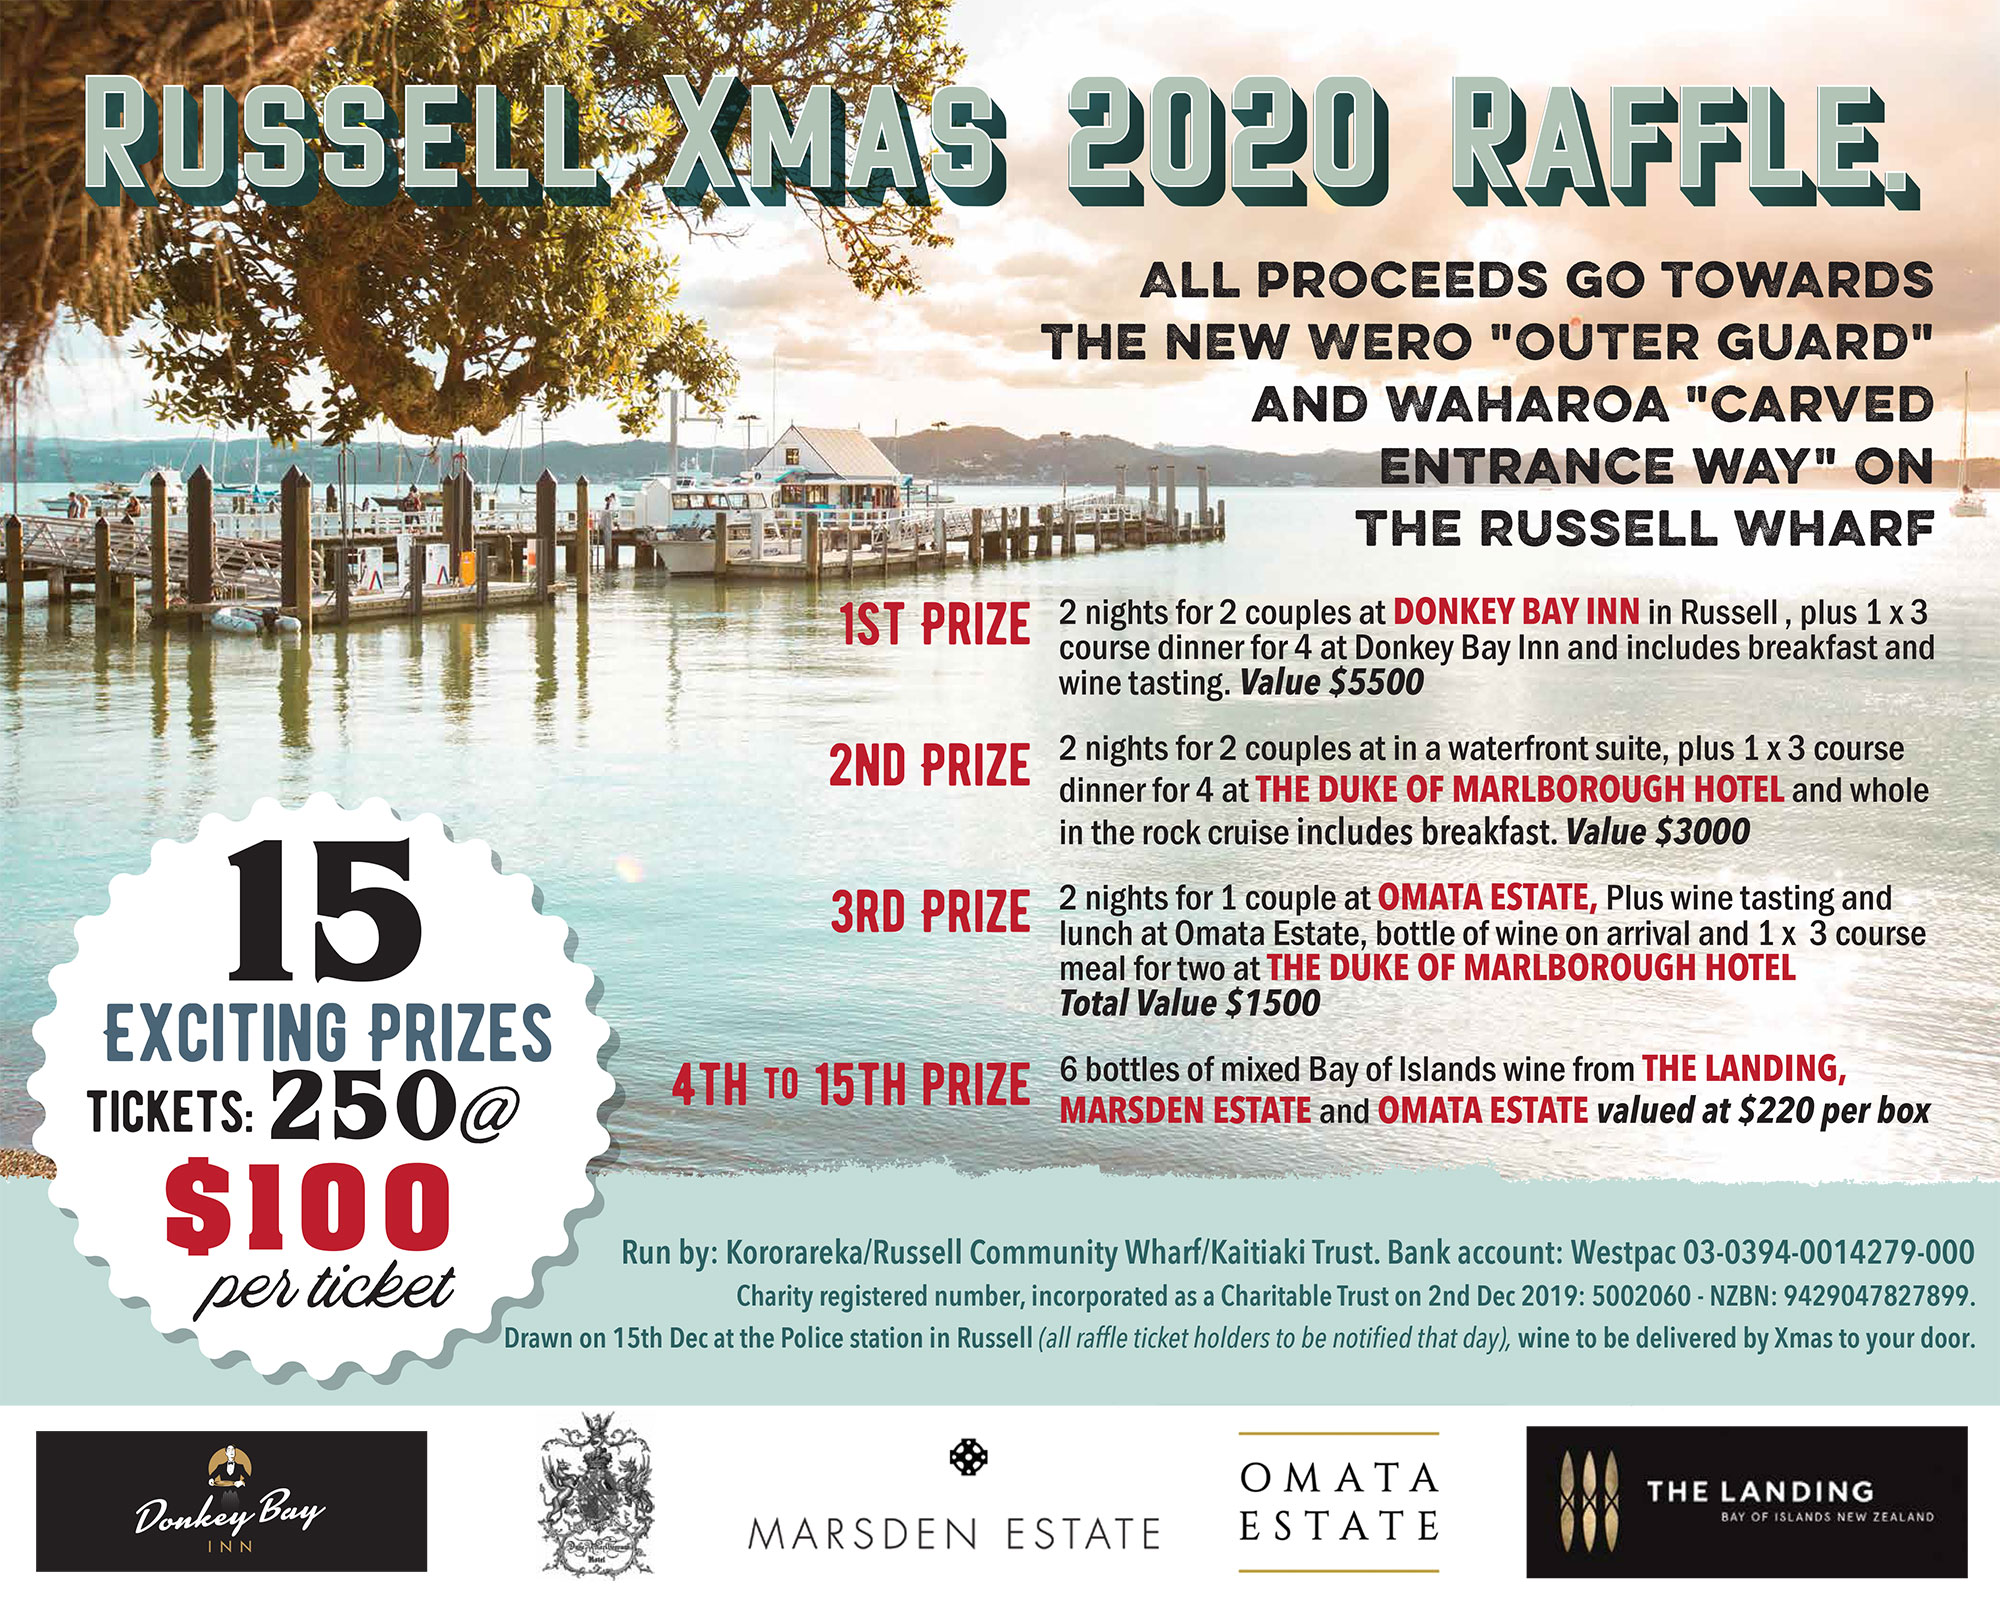 Russell Christmas Raffle